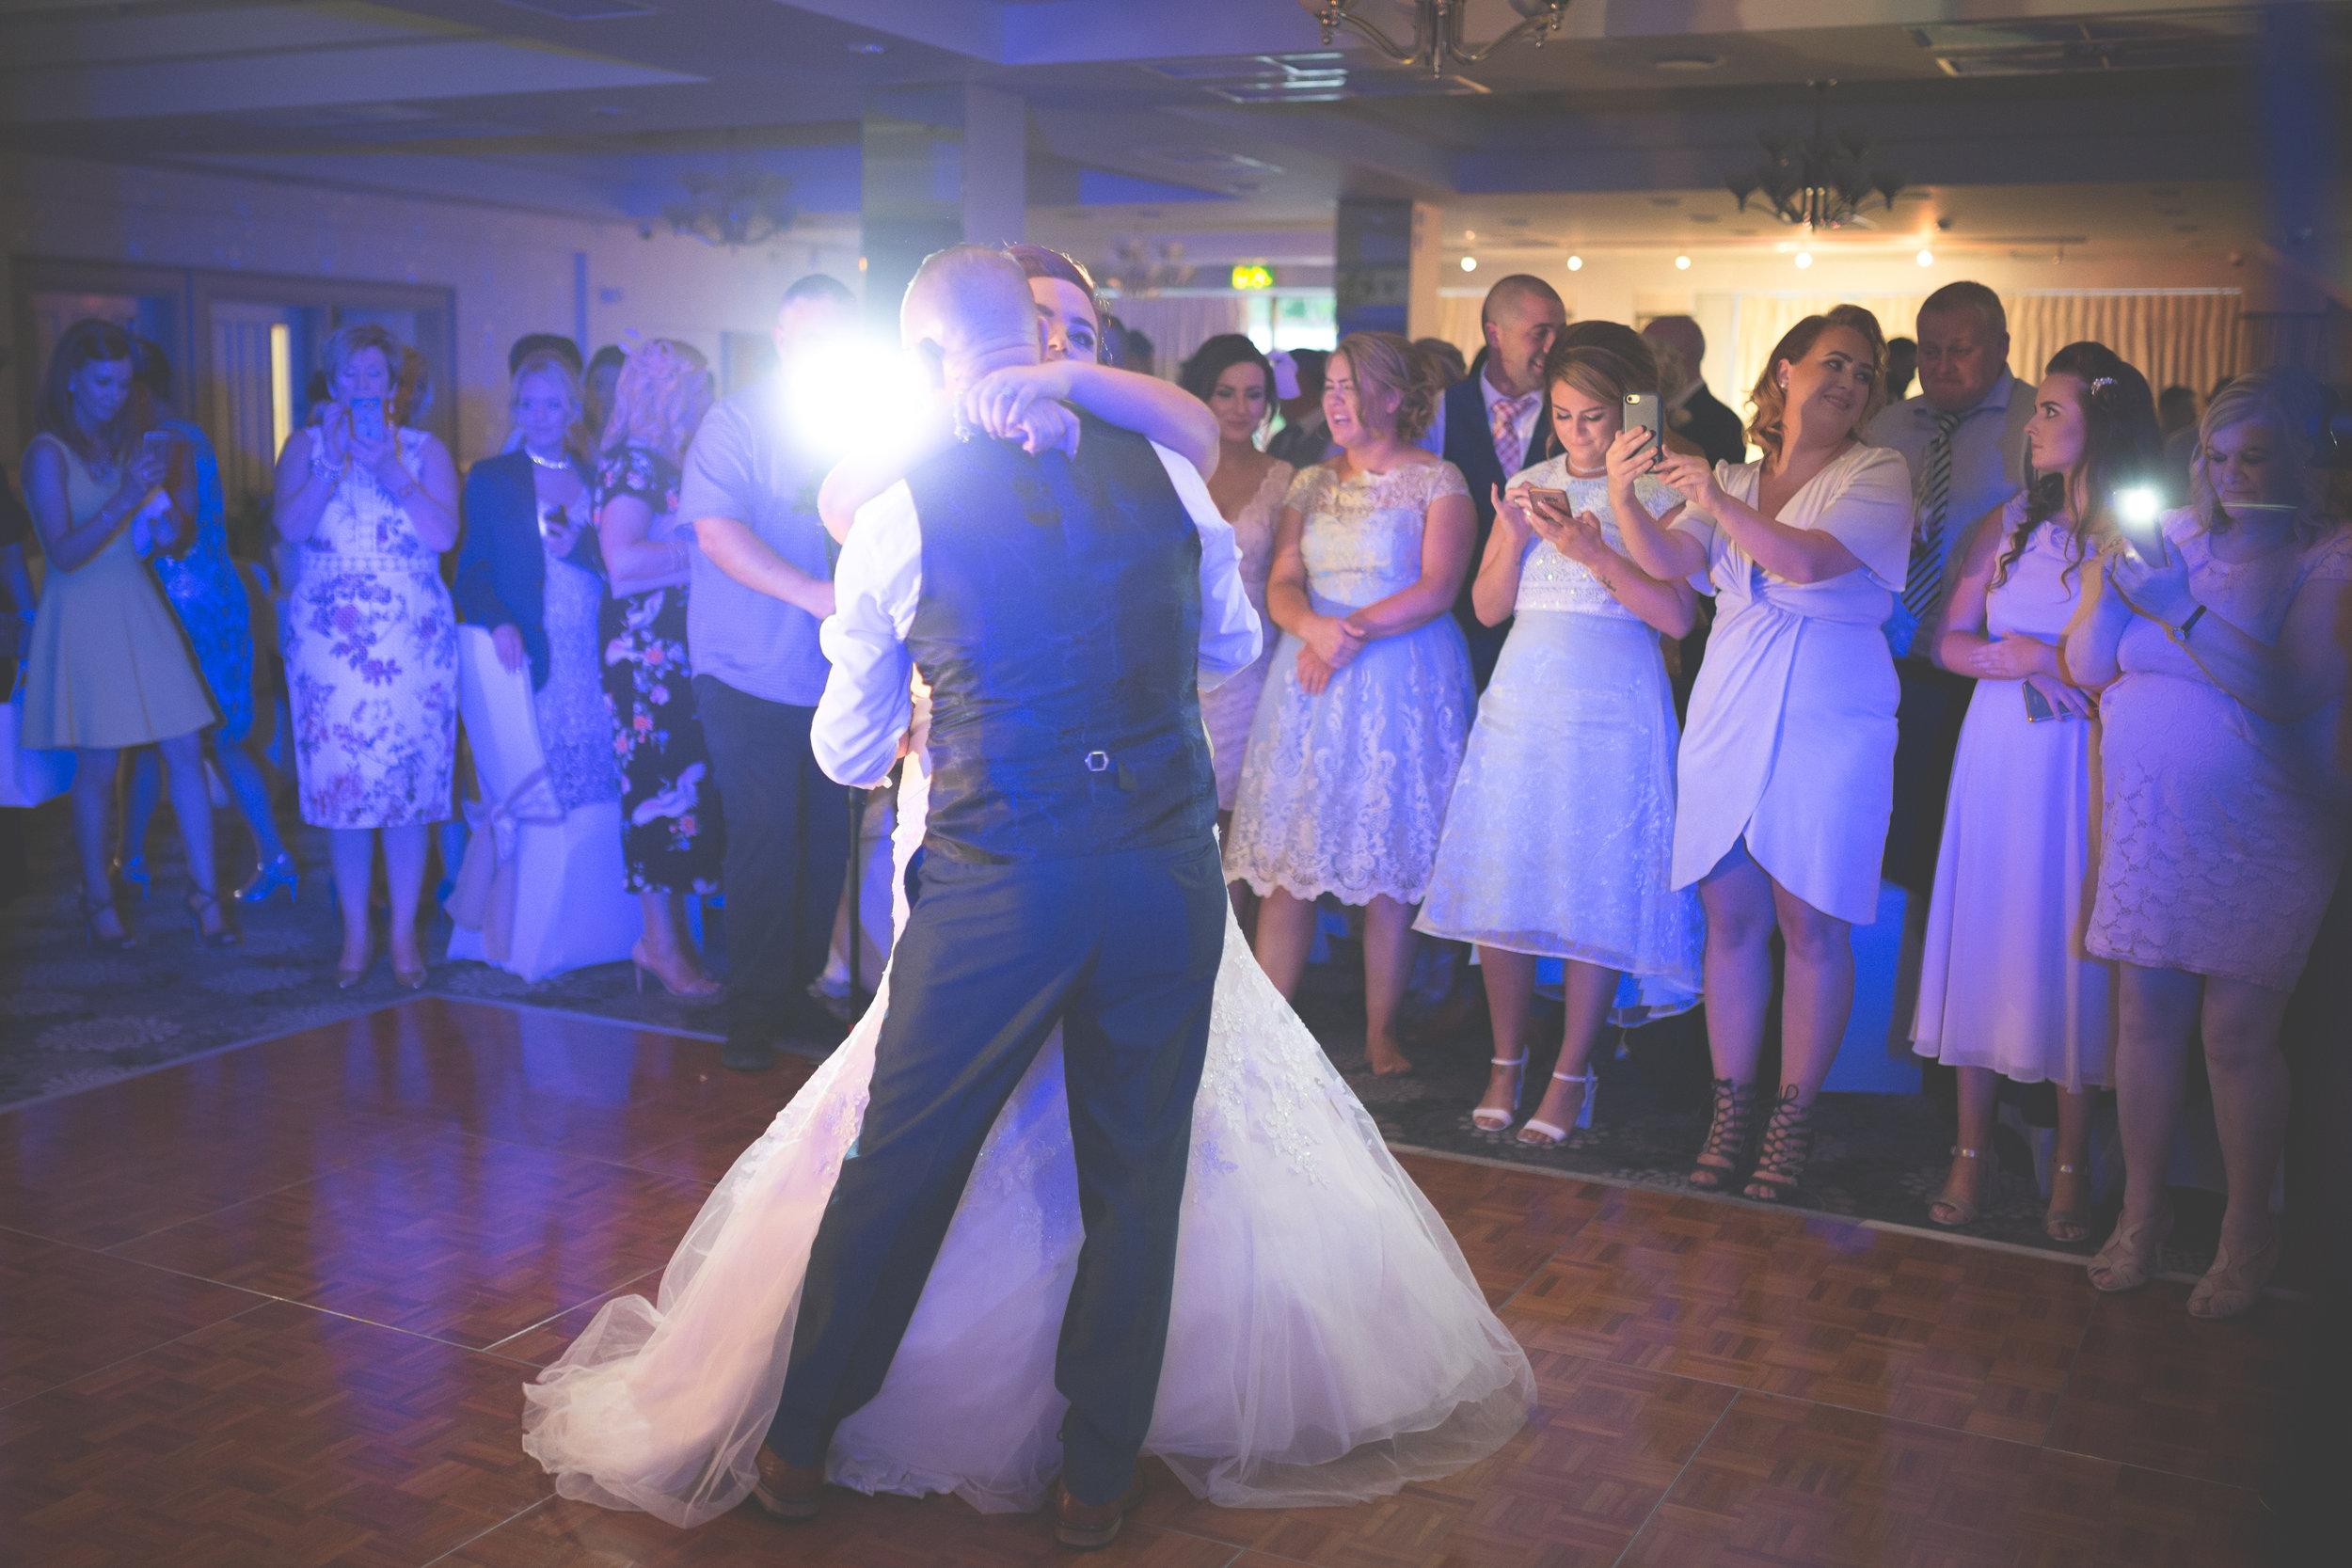 Antoinette & Stephen - First Dance | Brian McEwan Photography | Wedding Photographer Northern Ireland 40.jpg